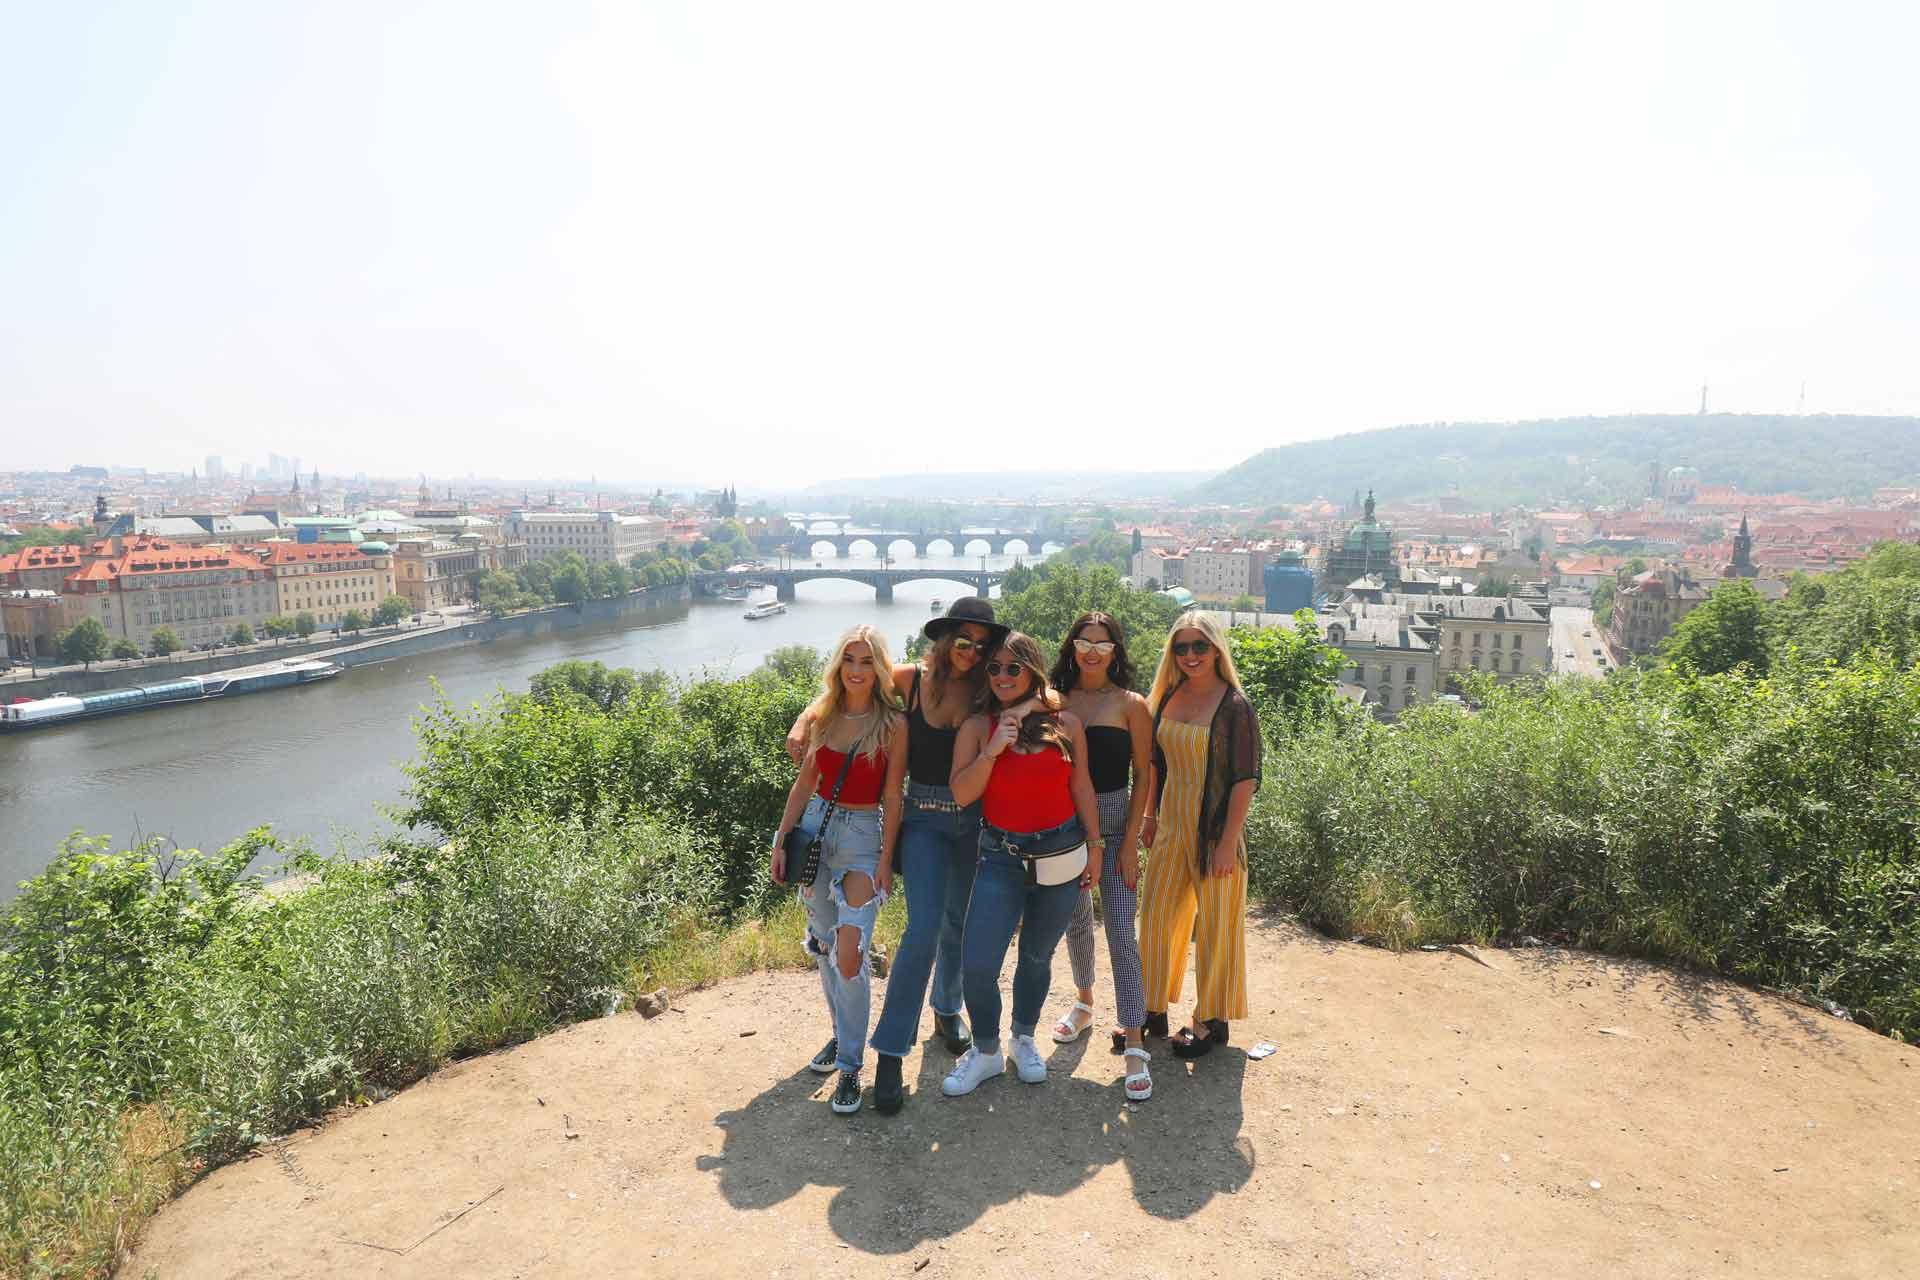 Prague bridges parade view from Letna